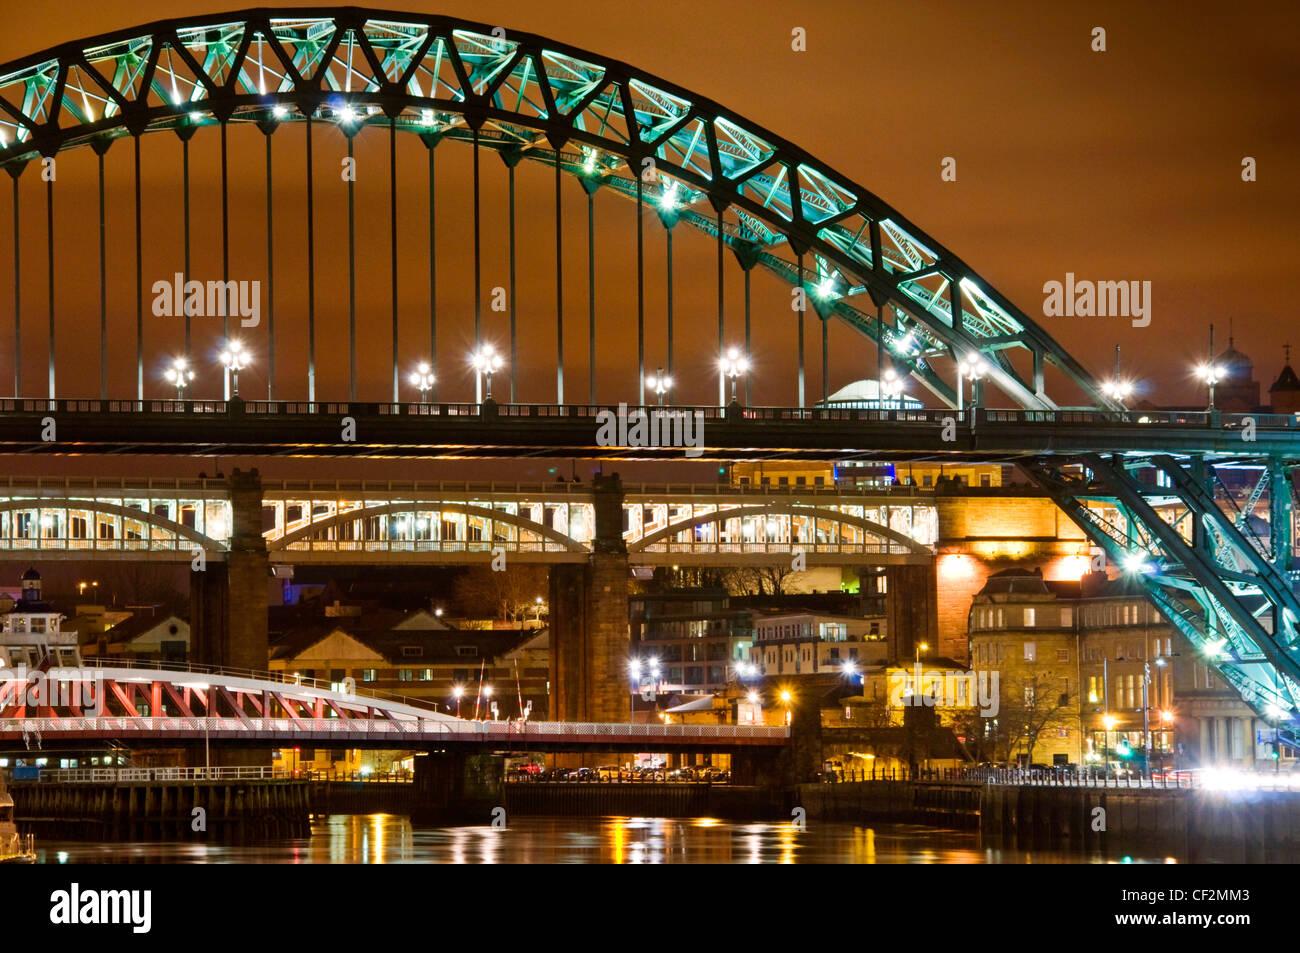 Blick auf den berühmten Tyne Brücken überspannt den Fluss Tyne, Newcastle Upon Tyne auf der Nordseite Stockbild